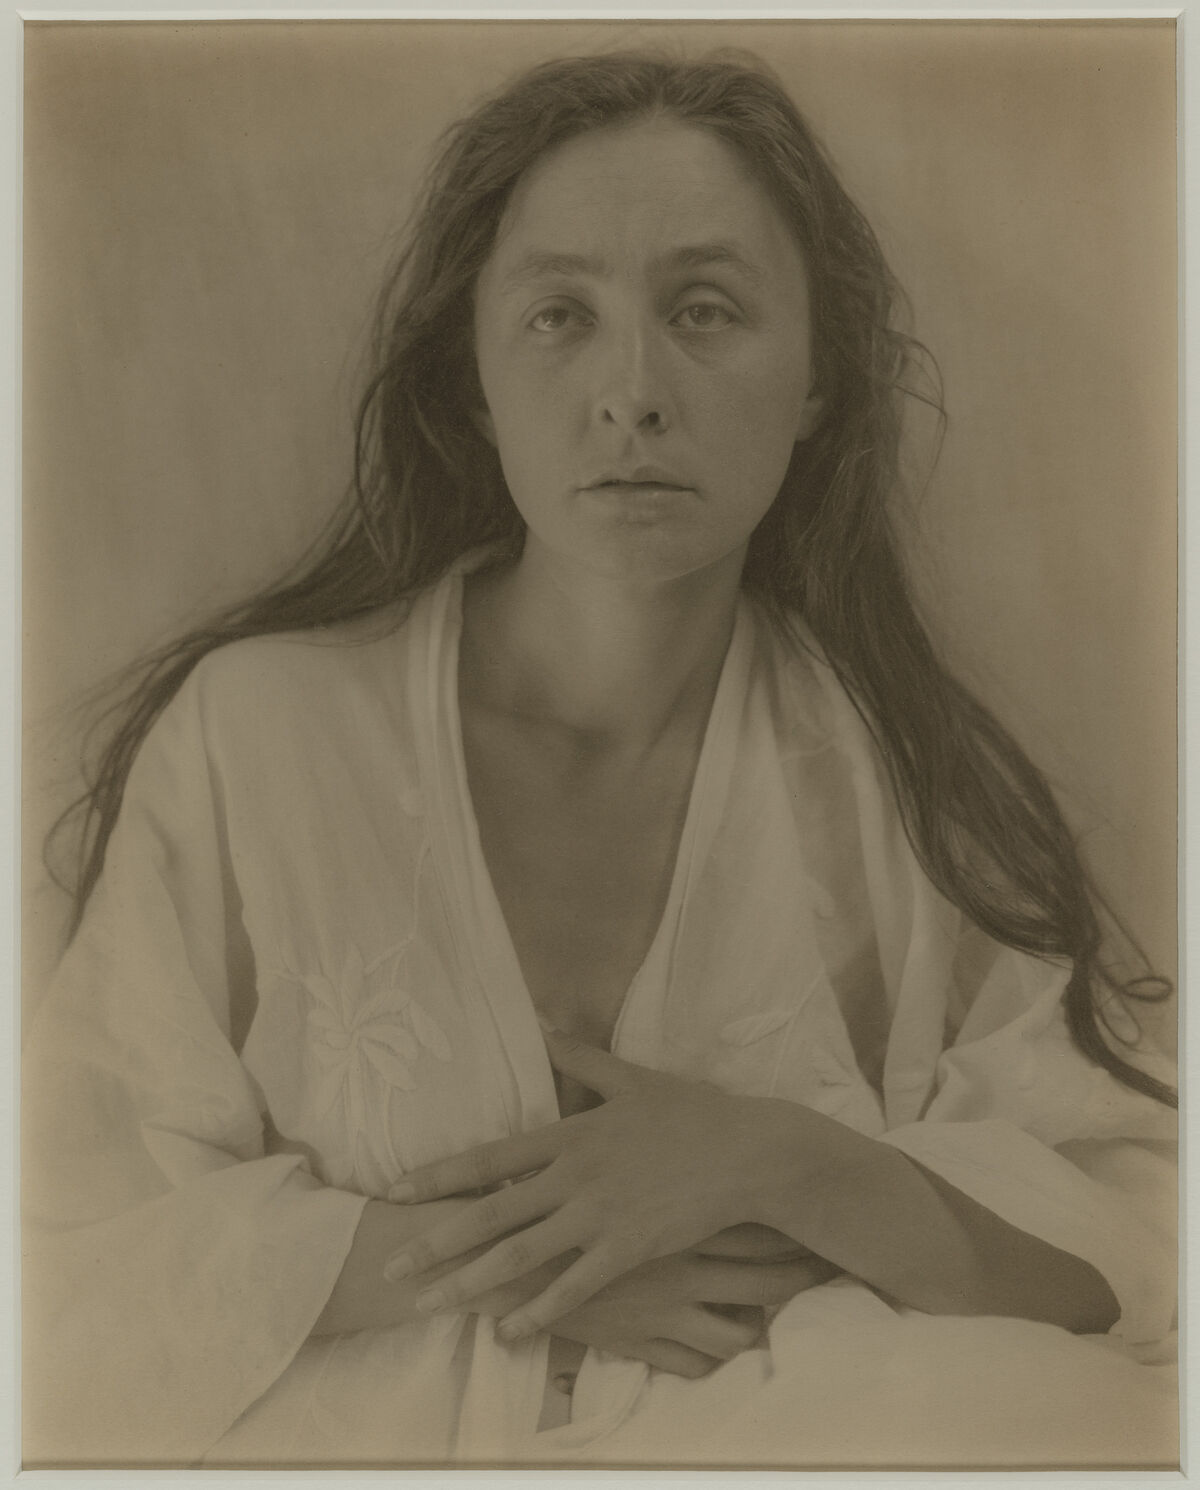 Alfred Stieglitz, Georgia O: Keeffe: A Portrait (1), 1918. Fotografia © Museu de Belas Artes, Boston.